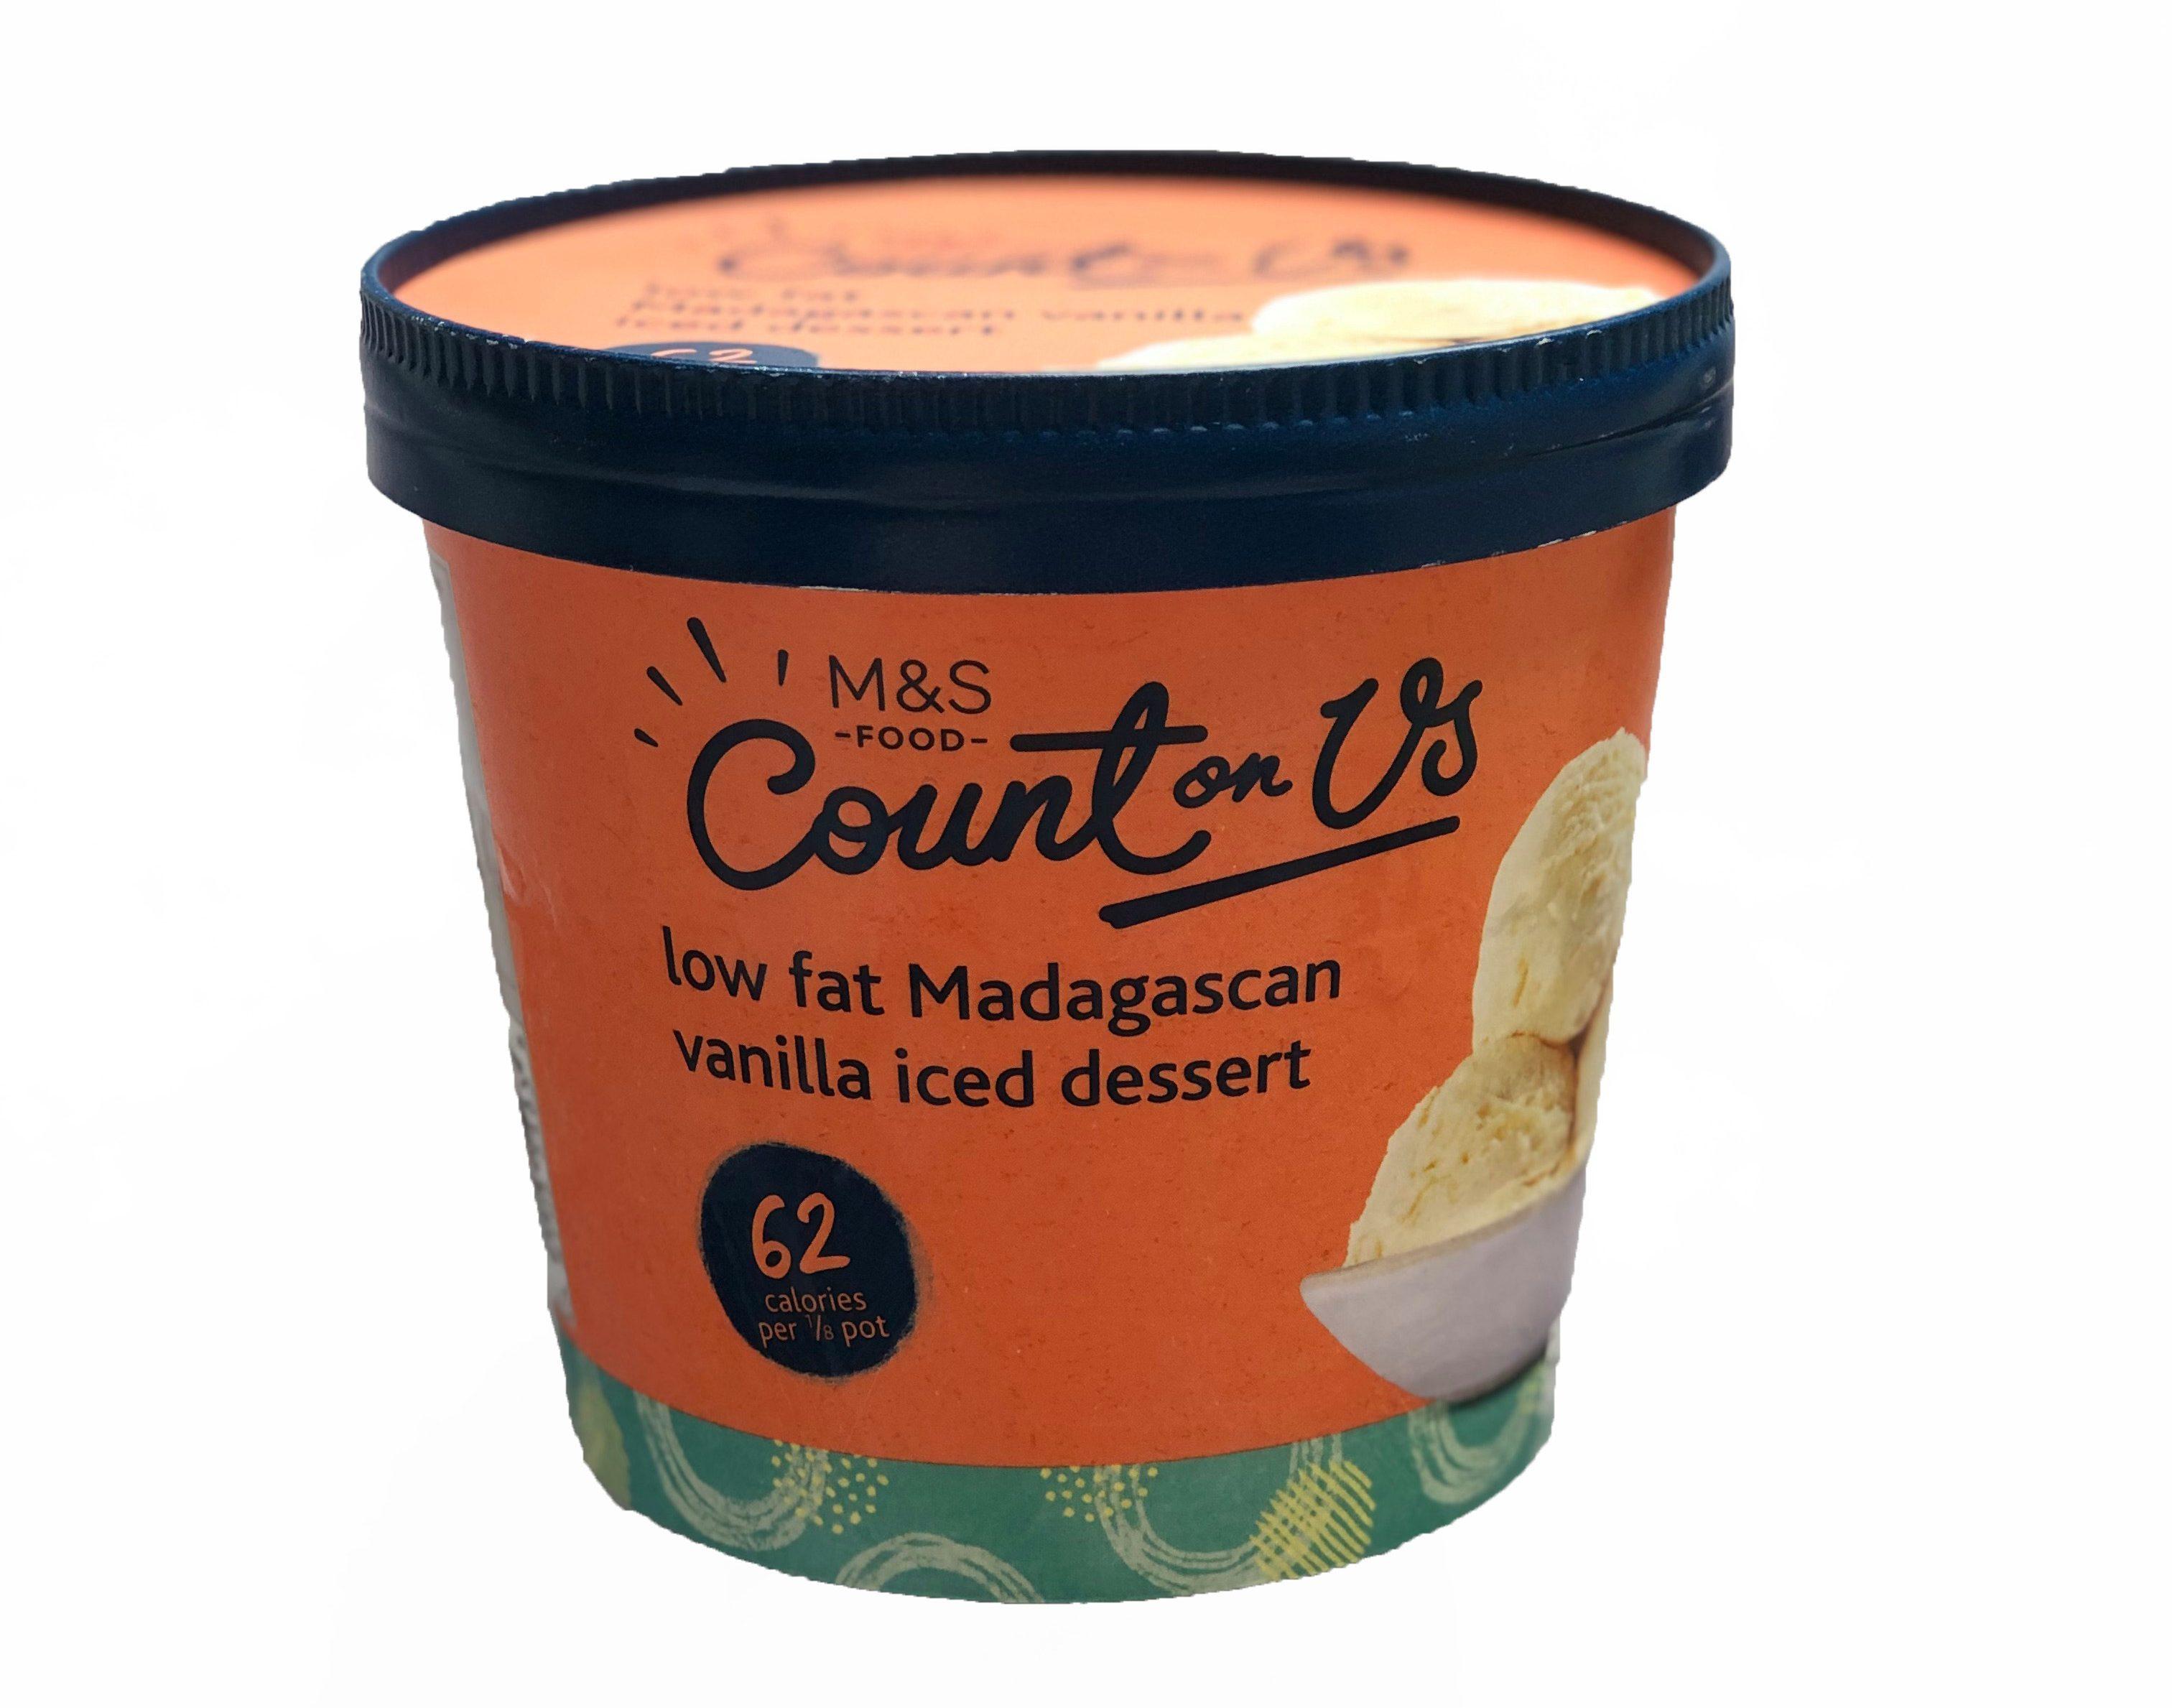 Find this low-fat Madagascan vanilla ice cream at M&S